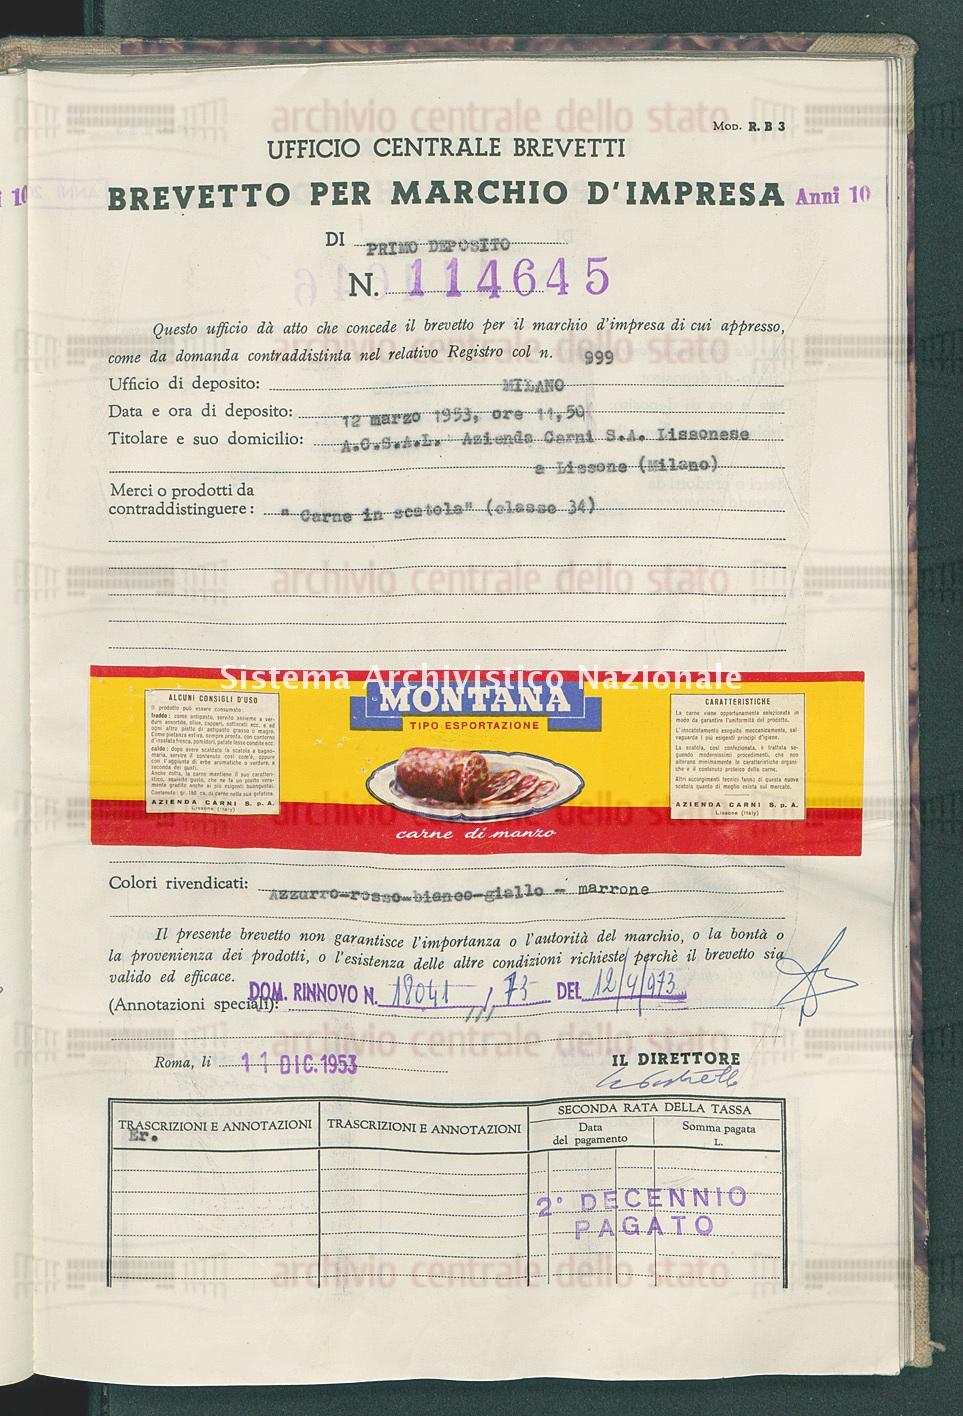 'Carne in scatola' A.C.S.A.D.Azienda Carni S.A.Lissonese (11/12/1953)